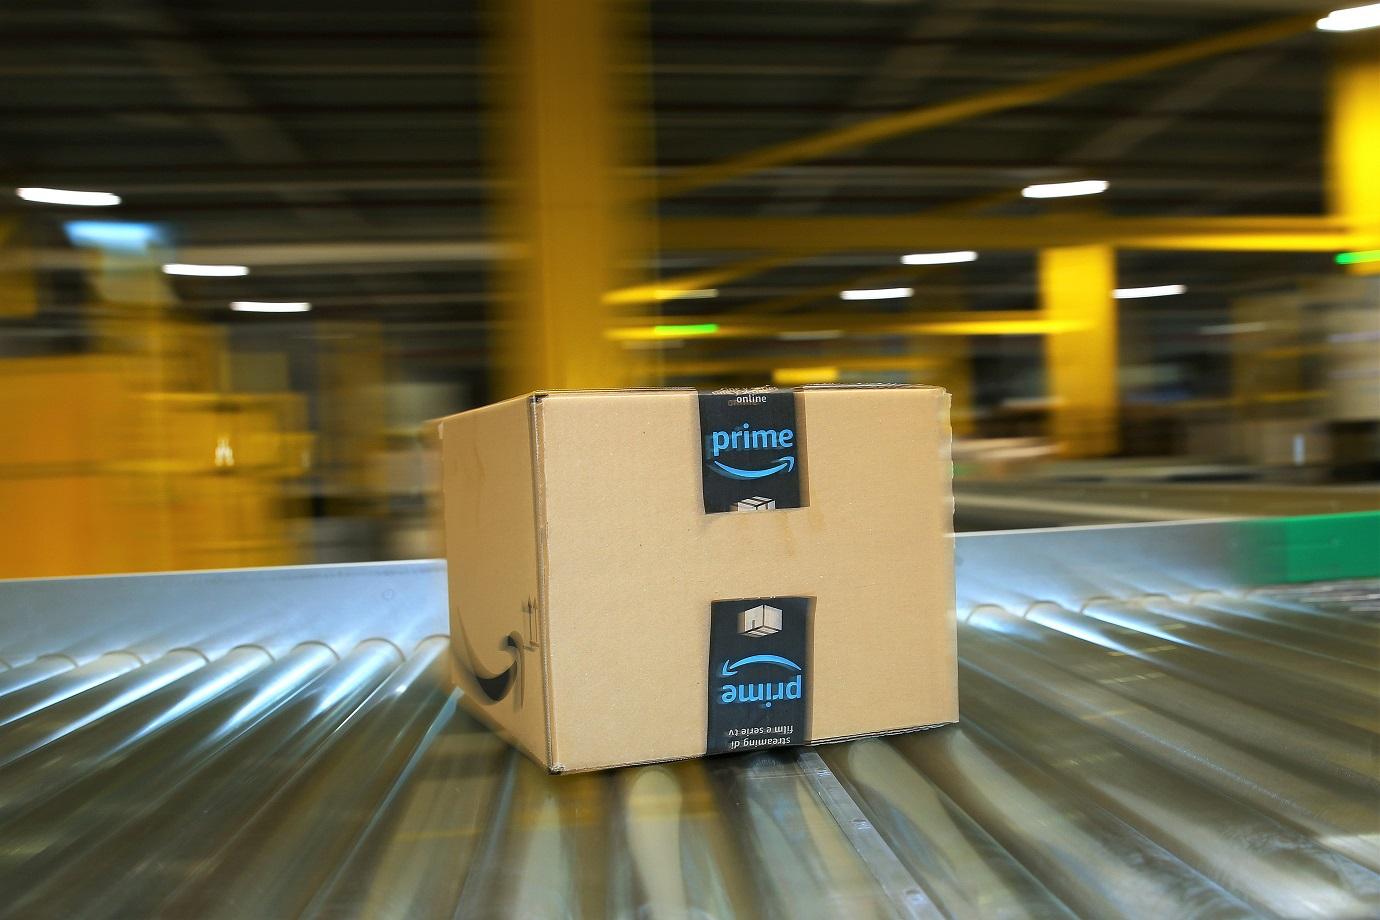 Caixa de entrega da Amazon. (Reprodução/Ronny Hartmann/Picture Alliance/Getty Images)